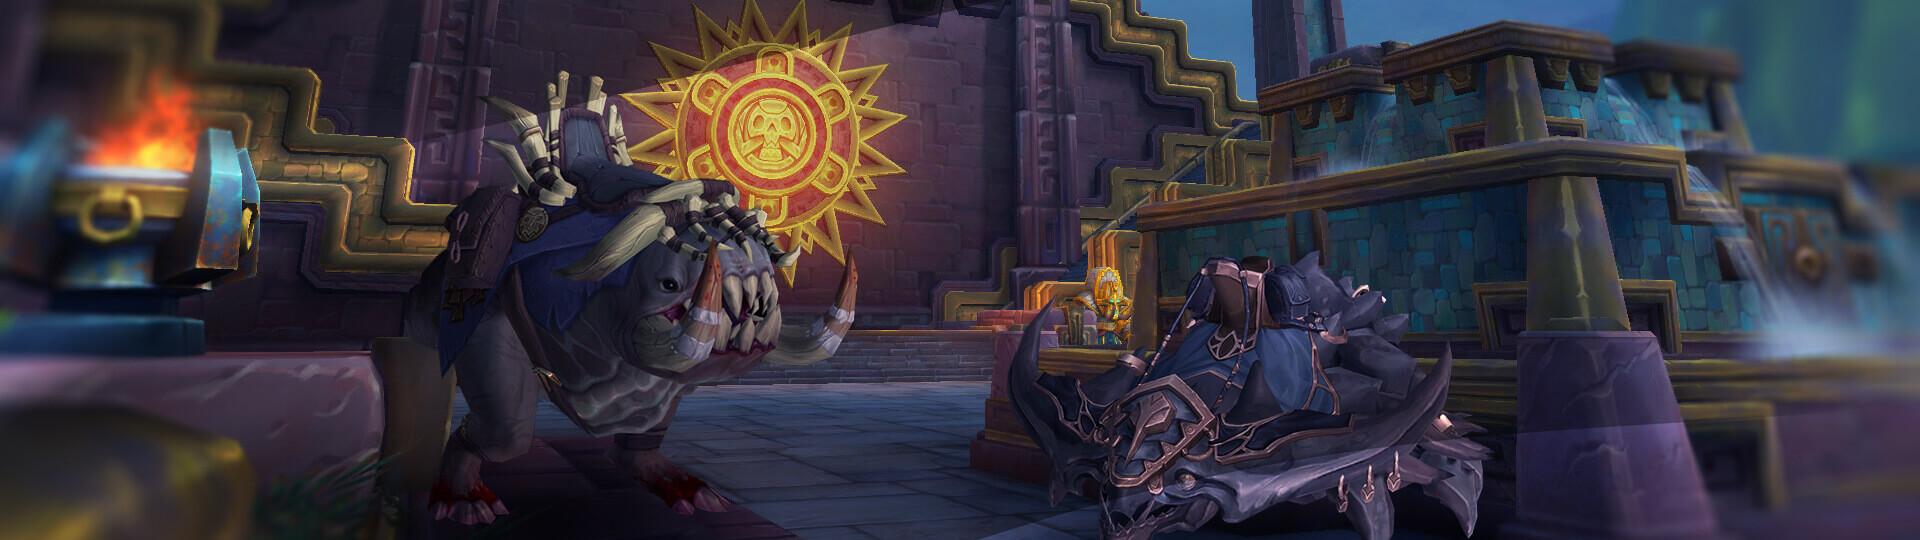 World of Warcraft best mounts